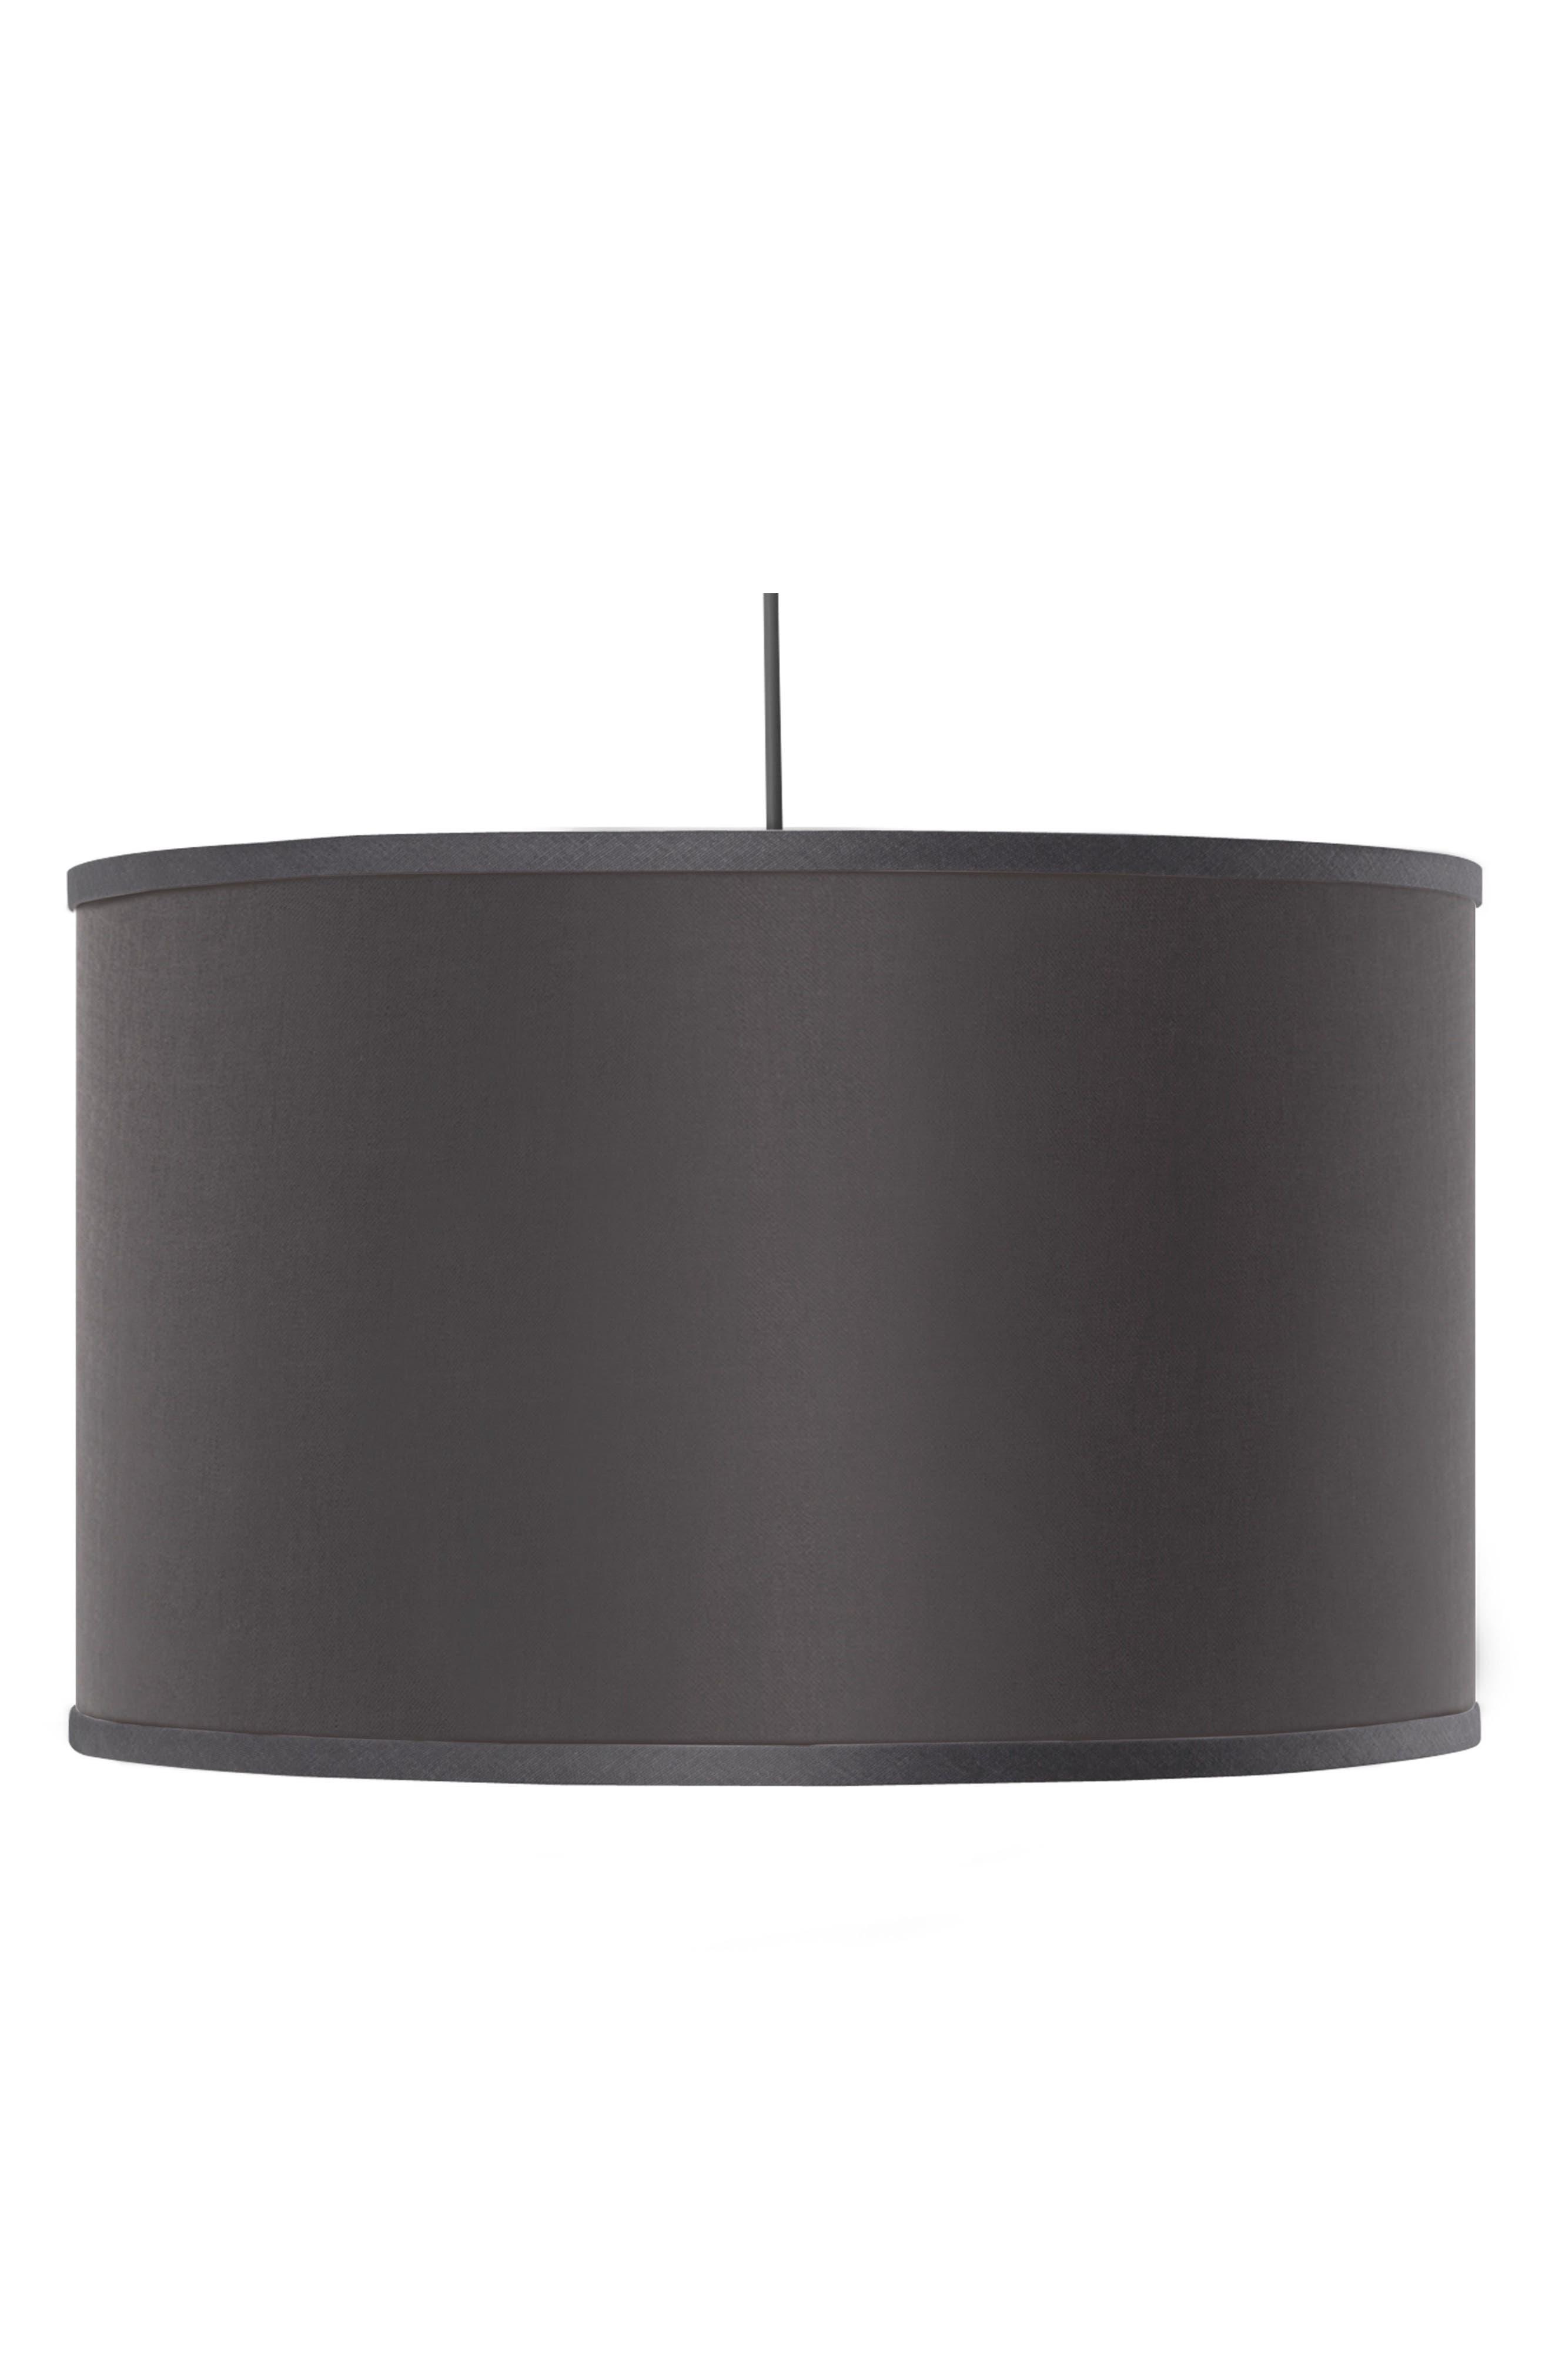 Large Cylinder Light,                             Main thumbnail 1, color,                             020